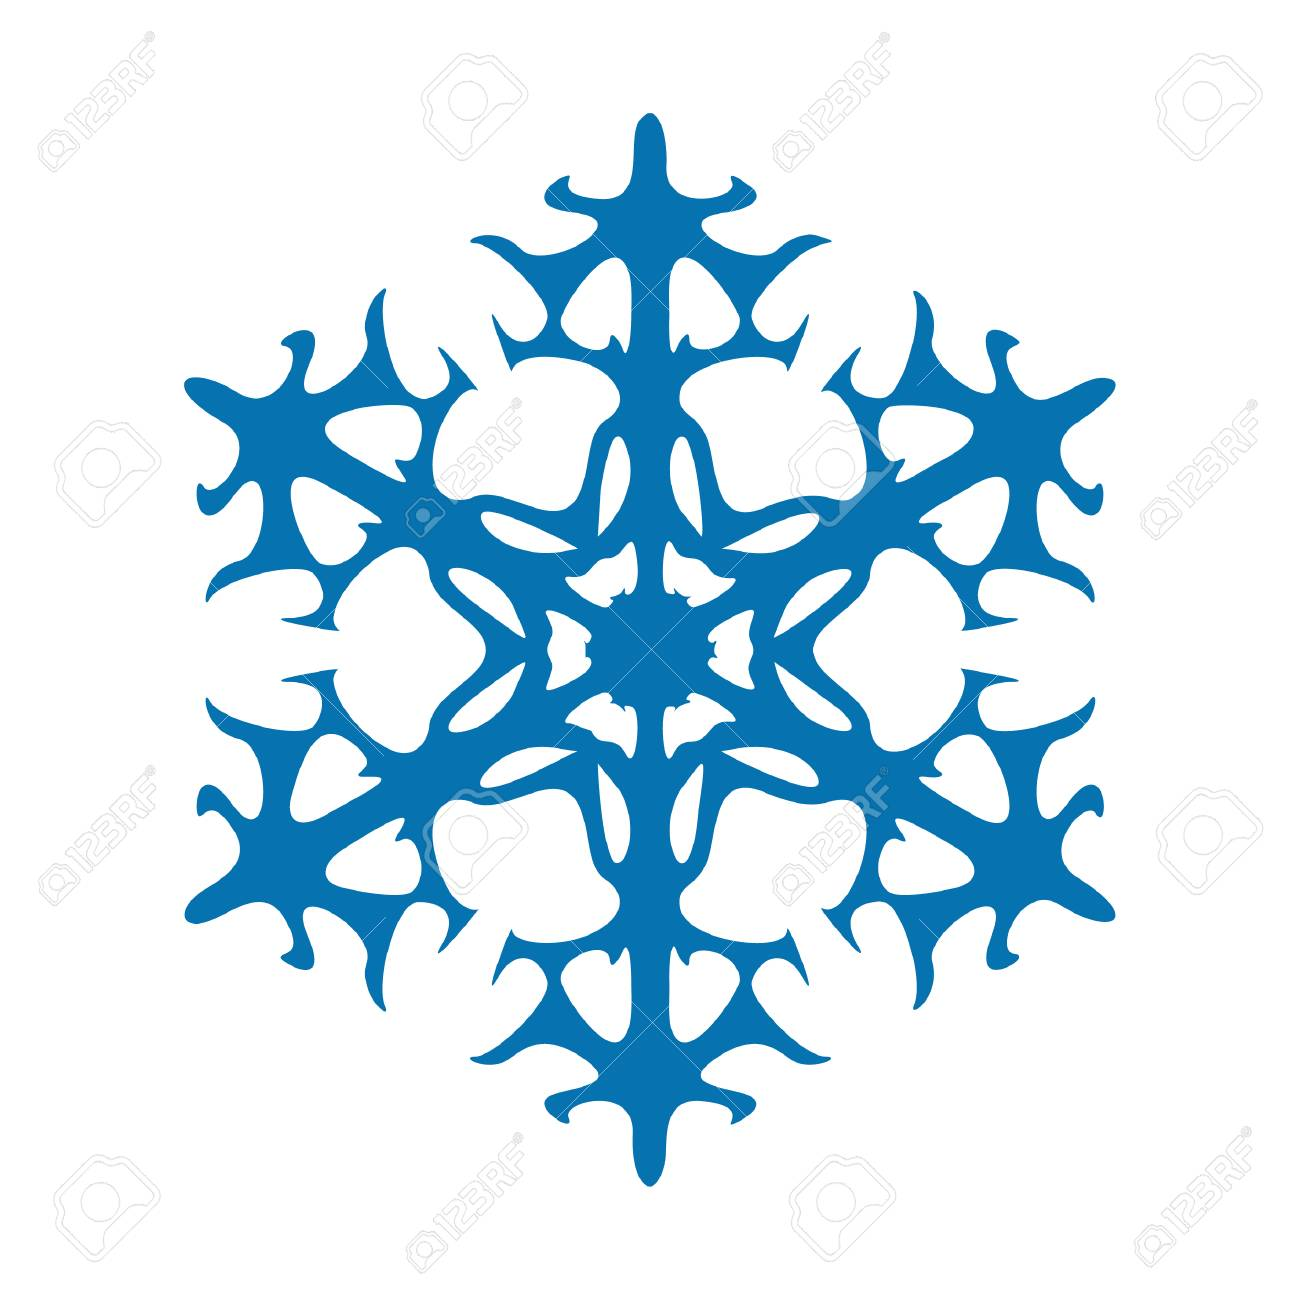 snowflake vector icon blue color winter white christmas snow rh 123rf com snowflake vector image snowflake vector image